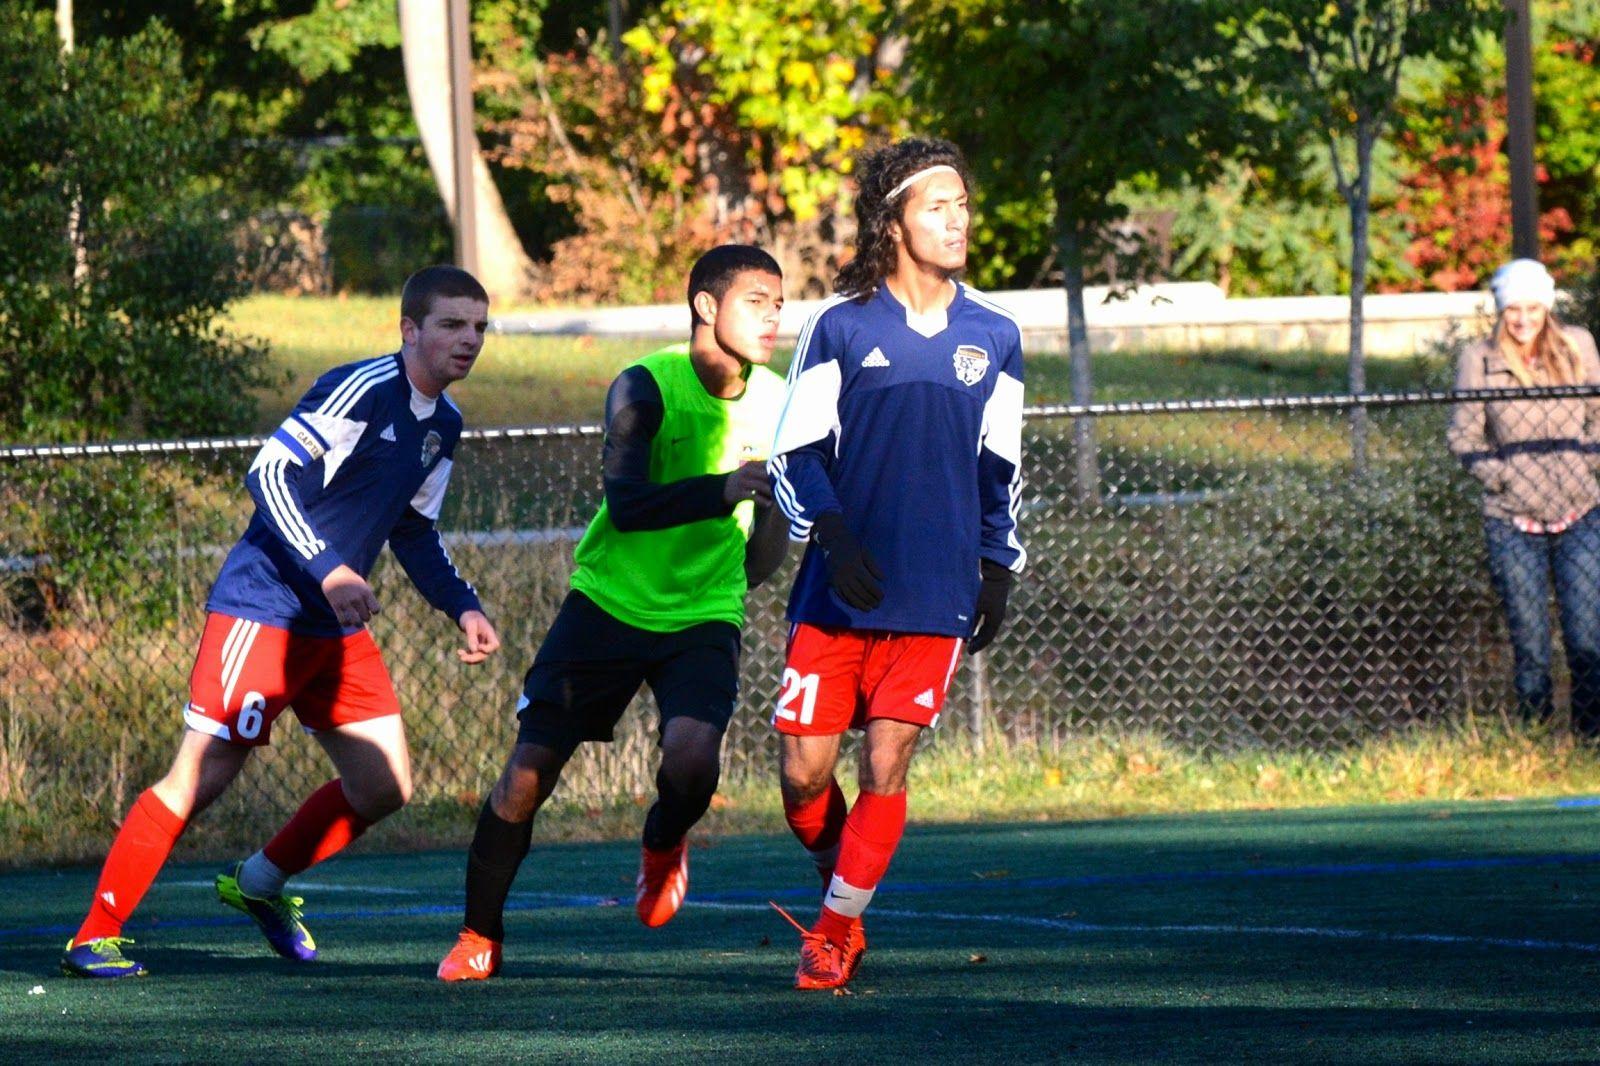 Team America 96 (TAFC96) vs BFC Barca 96 Elite (NCSL U18/U19 Division 1, October 5, 2014) -Brodie Edgerton #6, Maurice Martinez #21